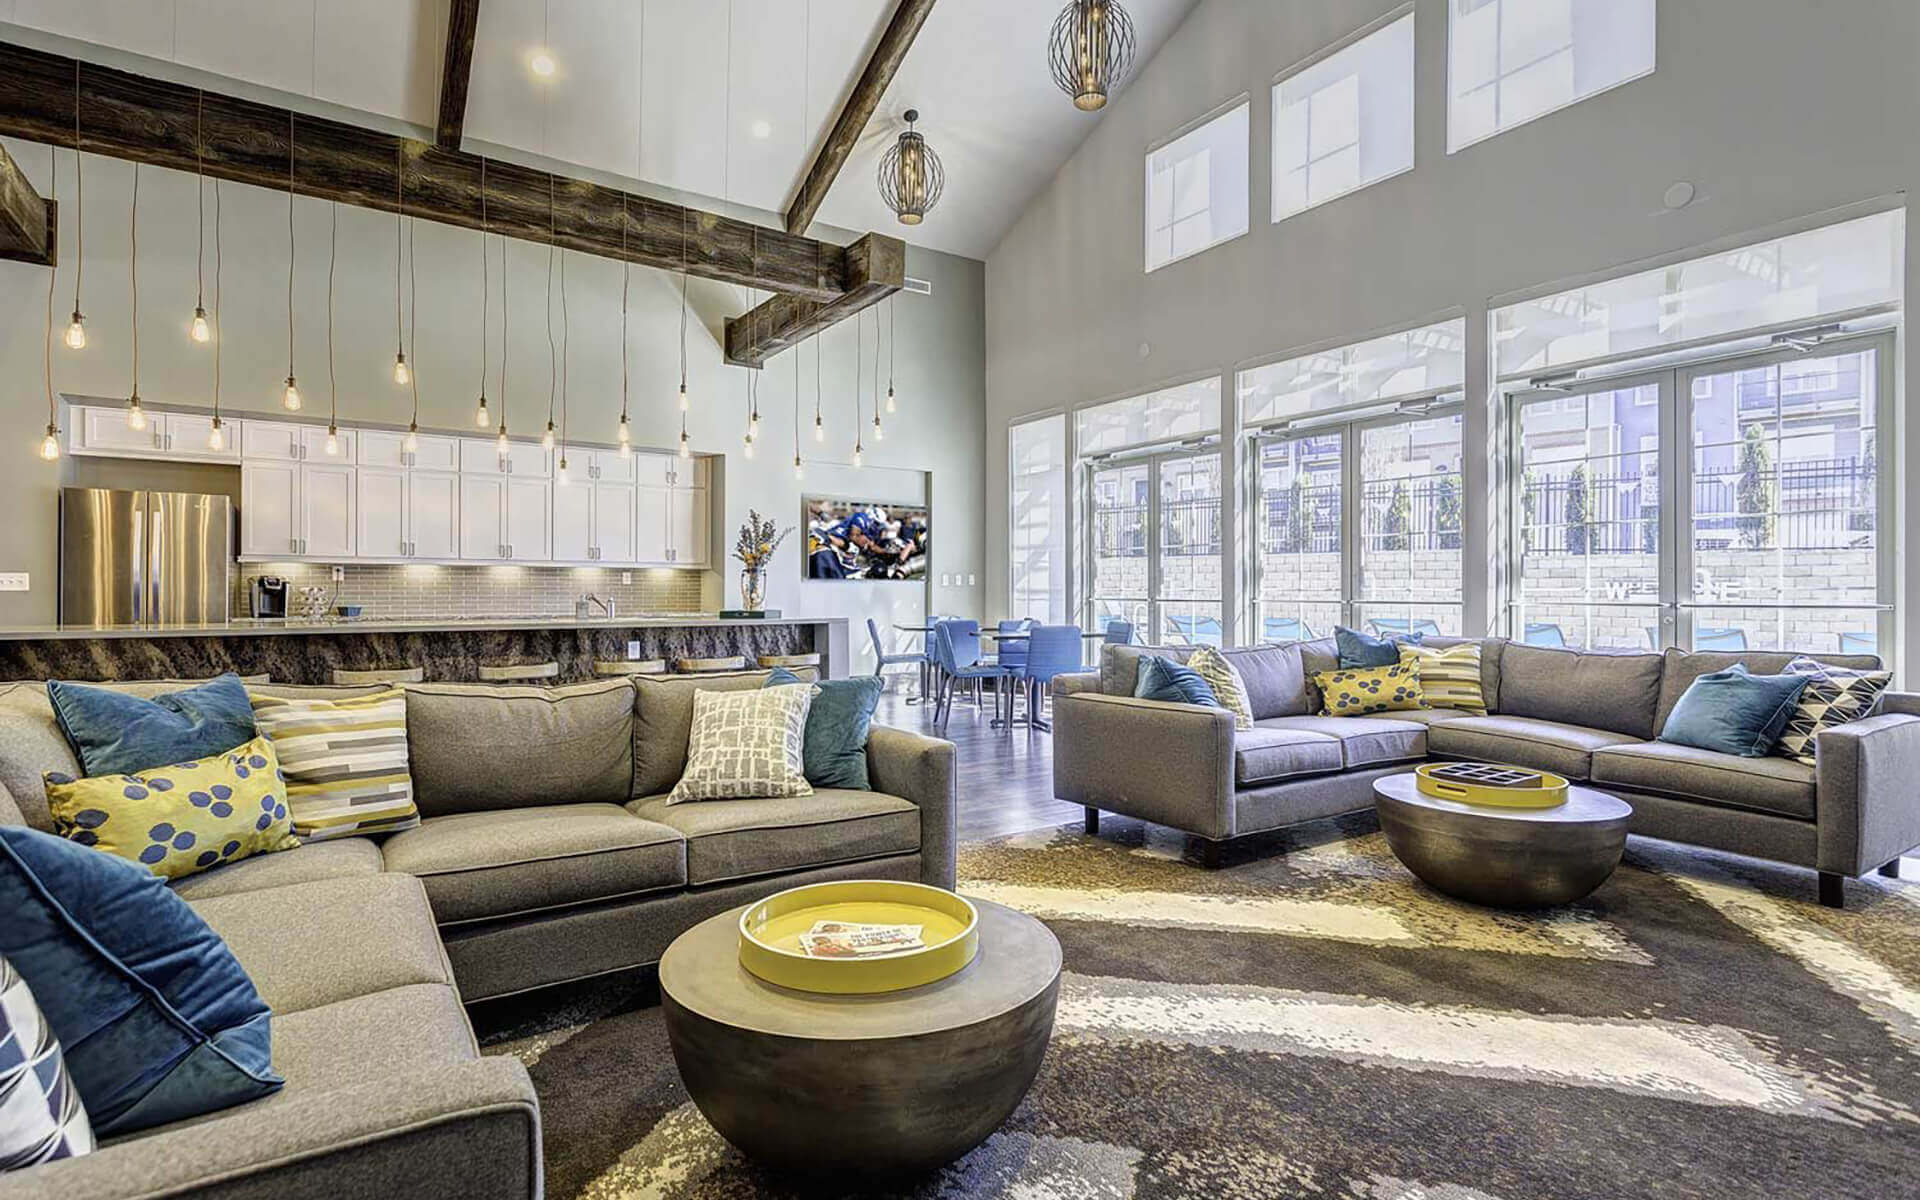 Whetstone Flats Apartments in Nashville, TN